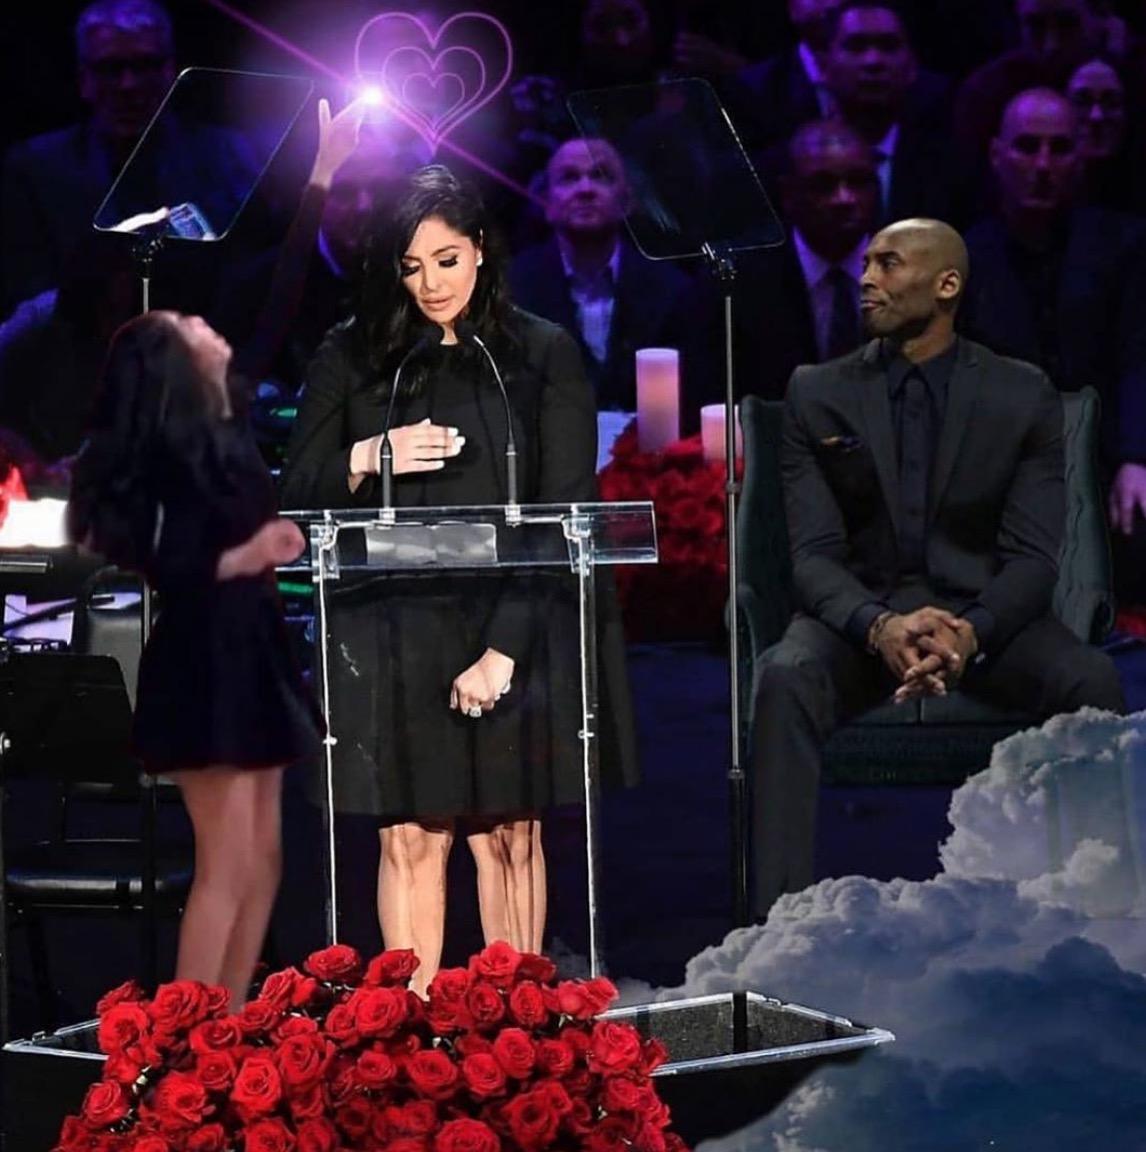 Snoop Dogg发布Vanessa致辞合成图:他们会永远伴你左右